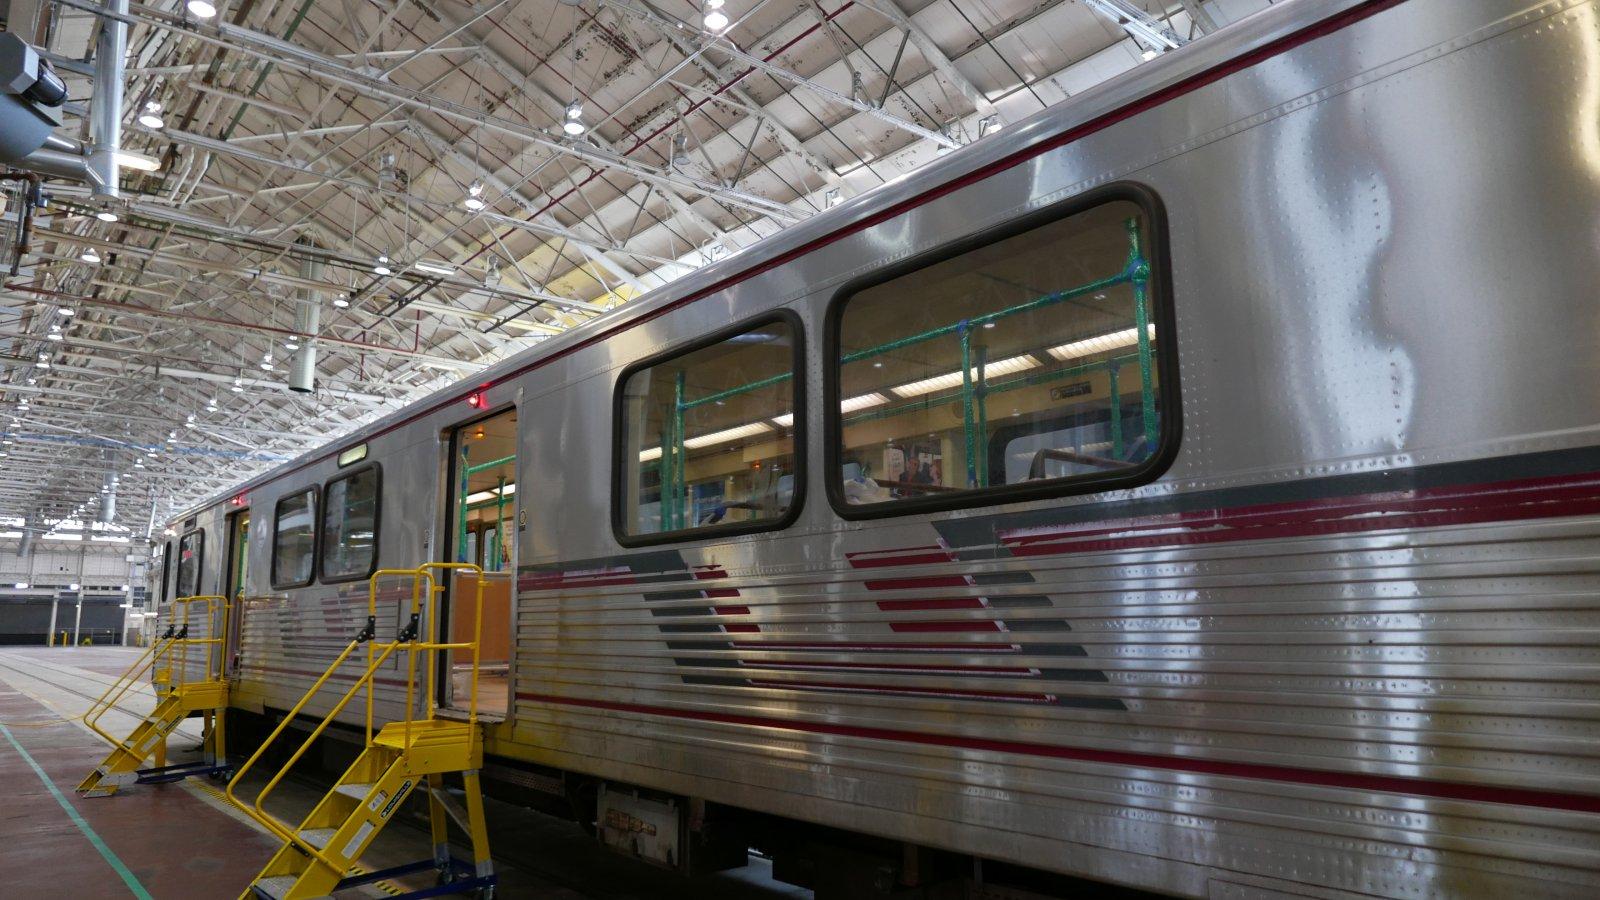 Railcar to refurbish